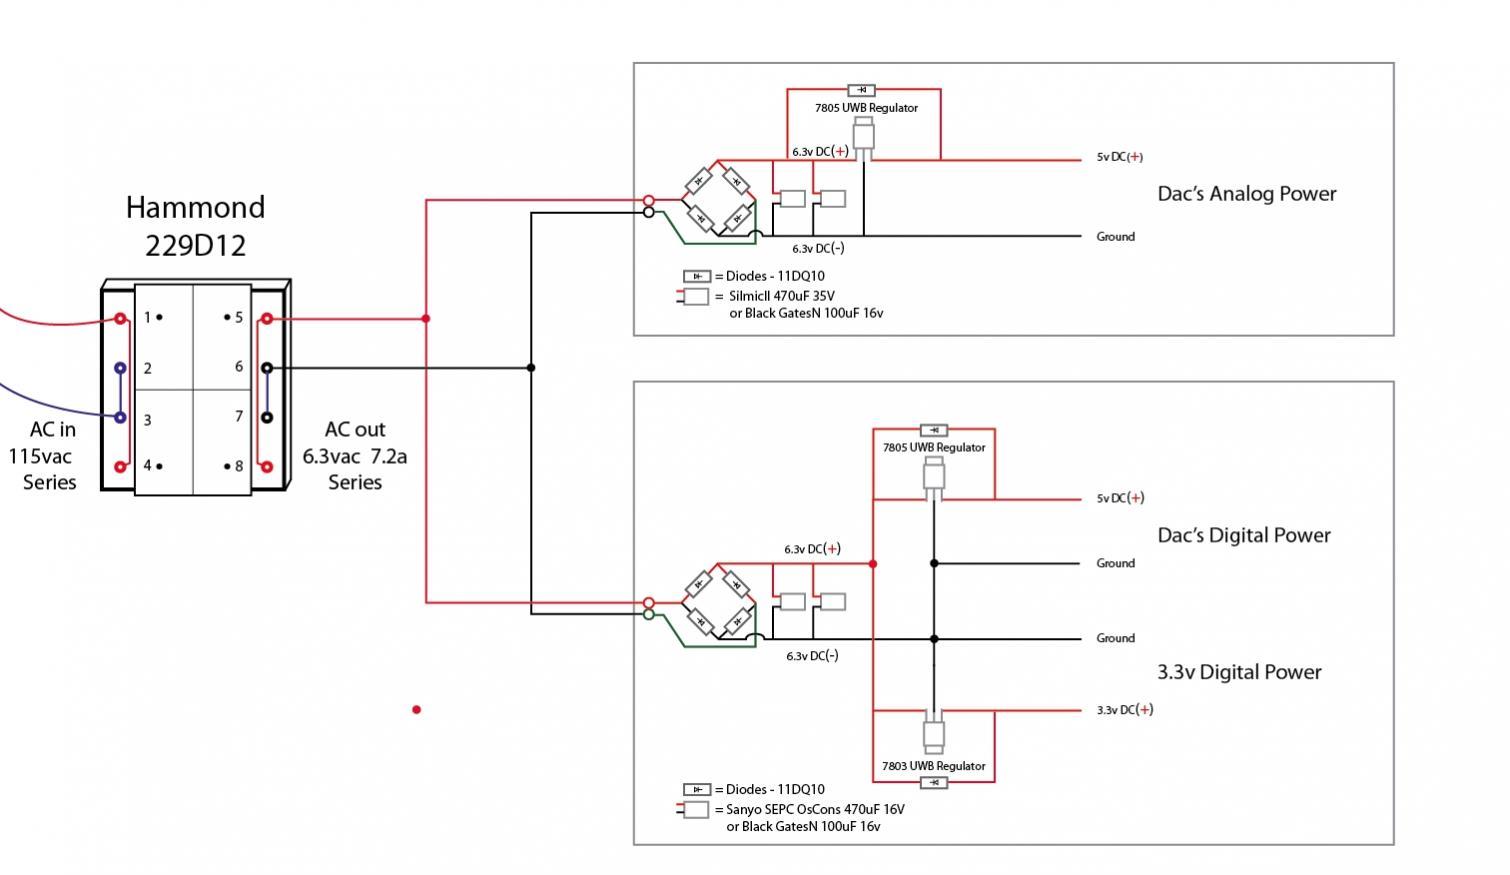 32810?resize\\\\\\\=665%2C385\\\\\\\&ssl\\\\\\\=1 headphone wiring diagram & headphone jack mesmerizing wiring skullcandy wiring diagram at honlapkeszites.co